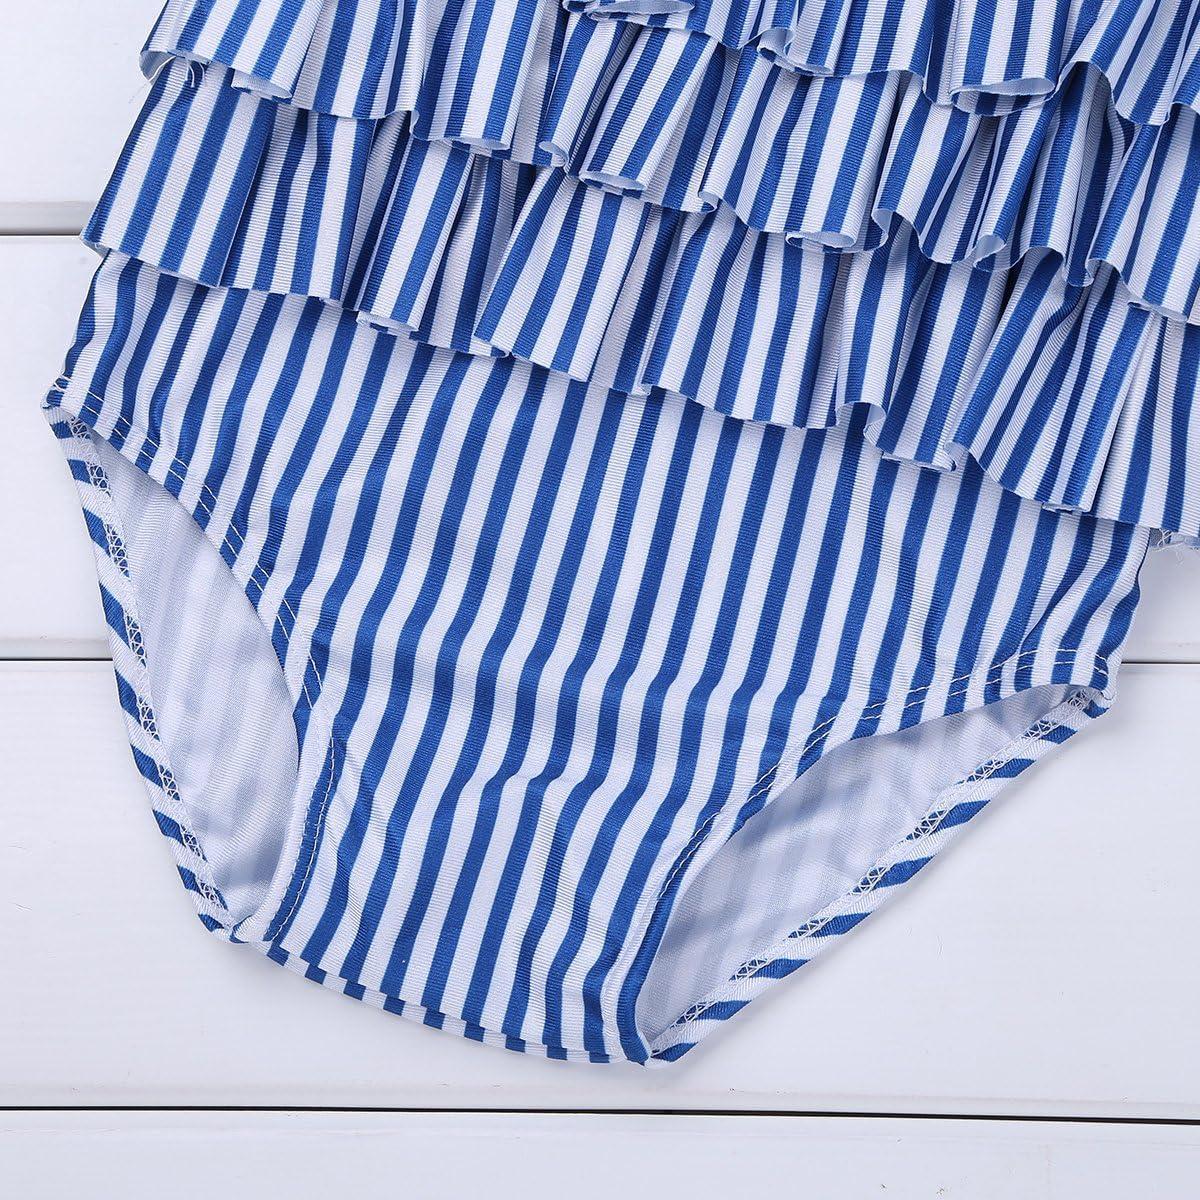 FEESHOW Toddler Baby Girls One Piece Striped Swimsuit Cutie Bowknot Ruffle Swimwear Bathing Suit Blue/&White 2T//3T